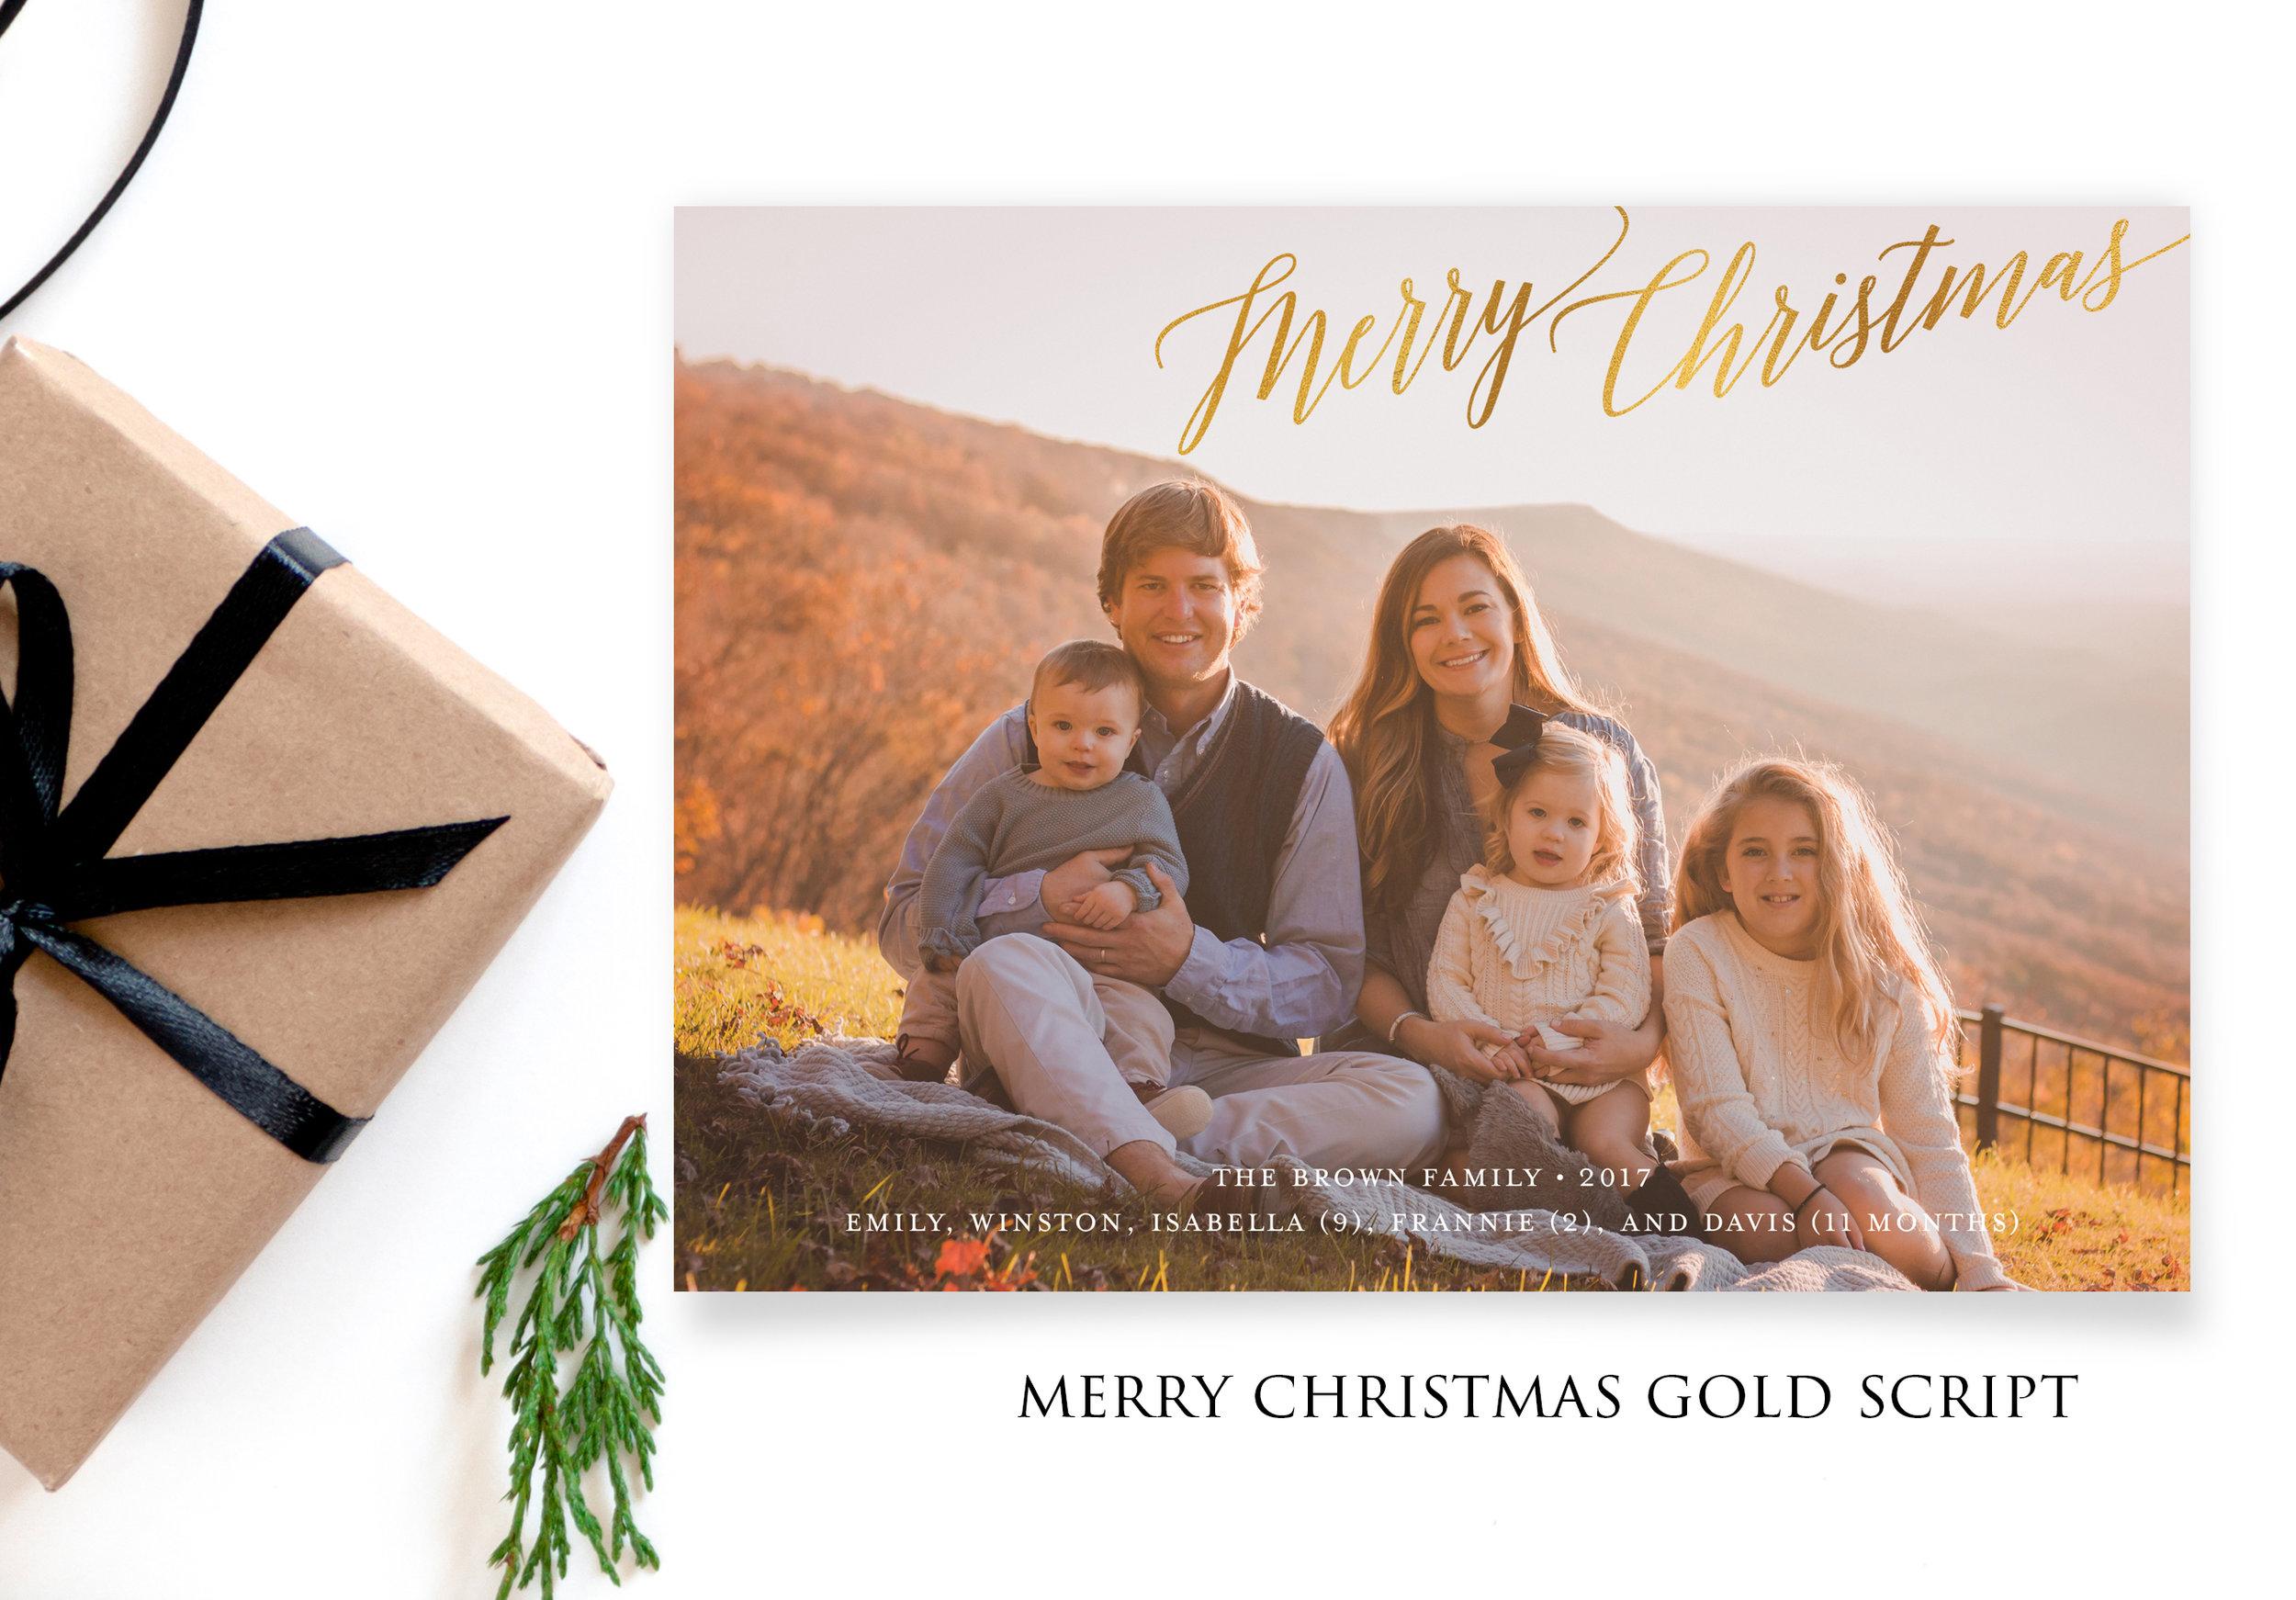 MerryChristmasGold_web.jpg